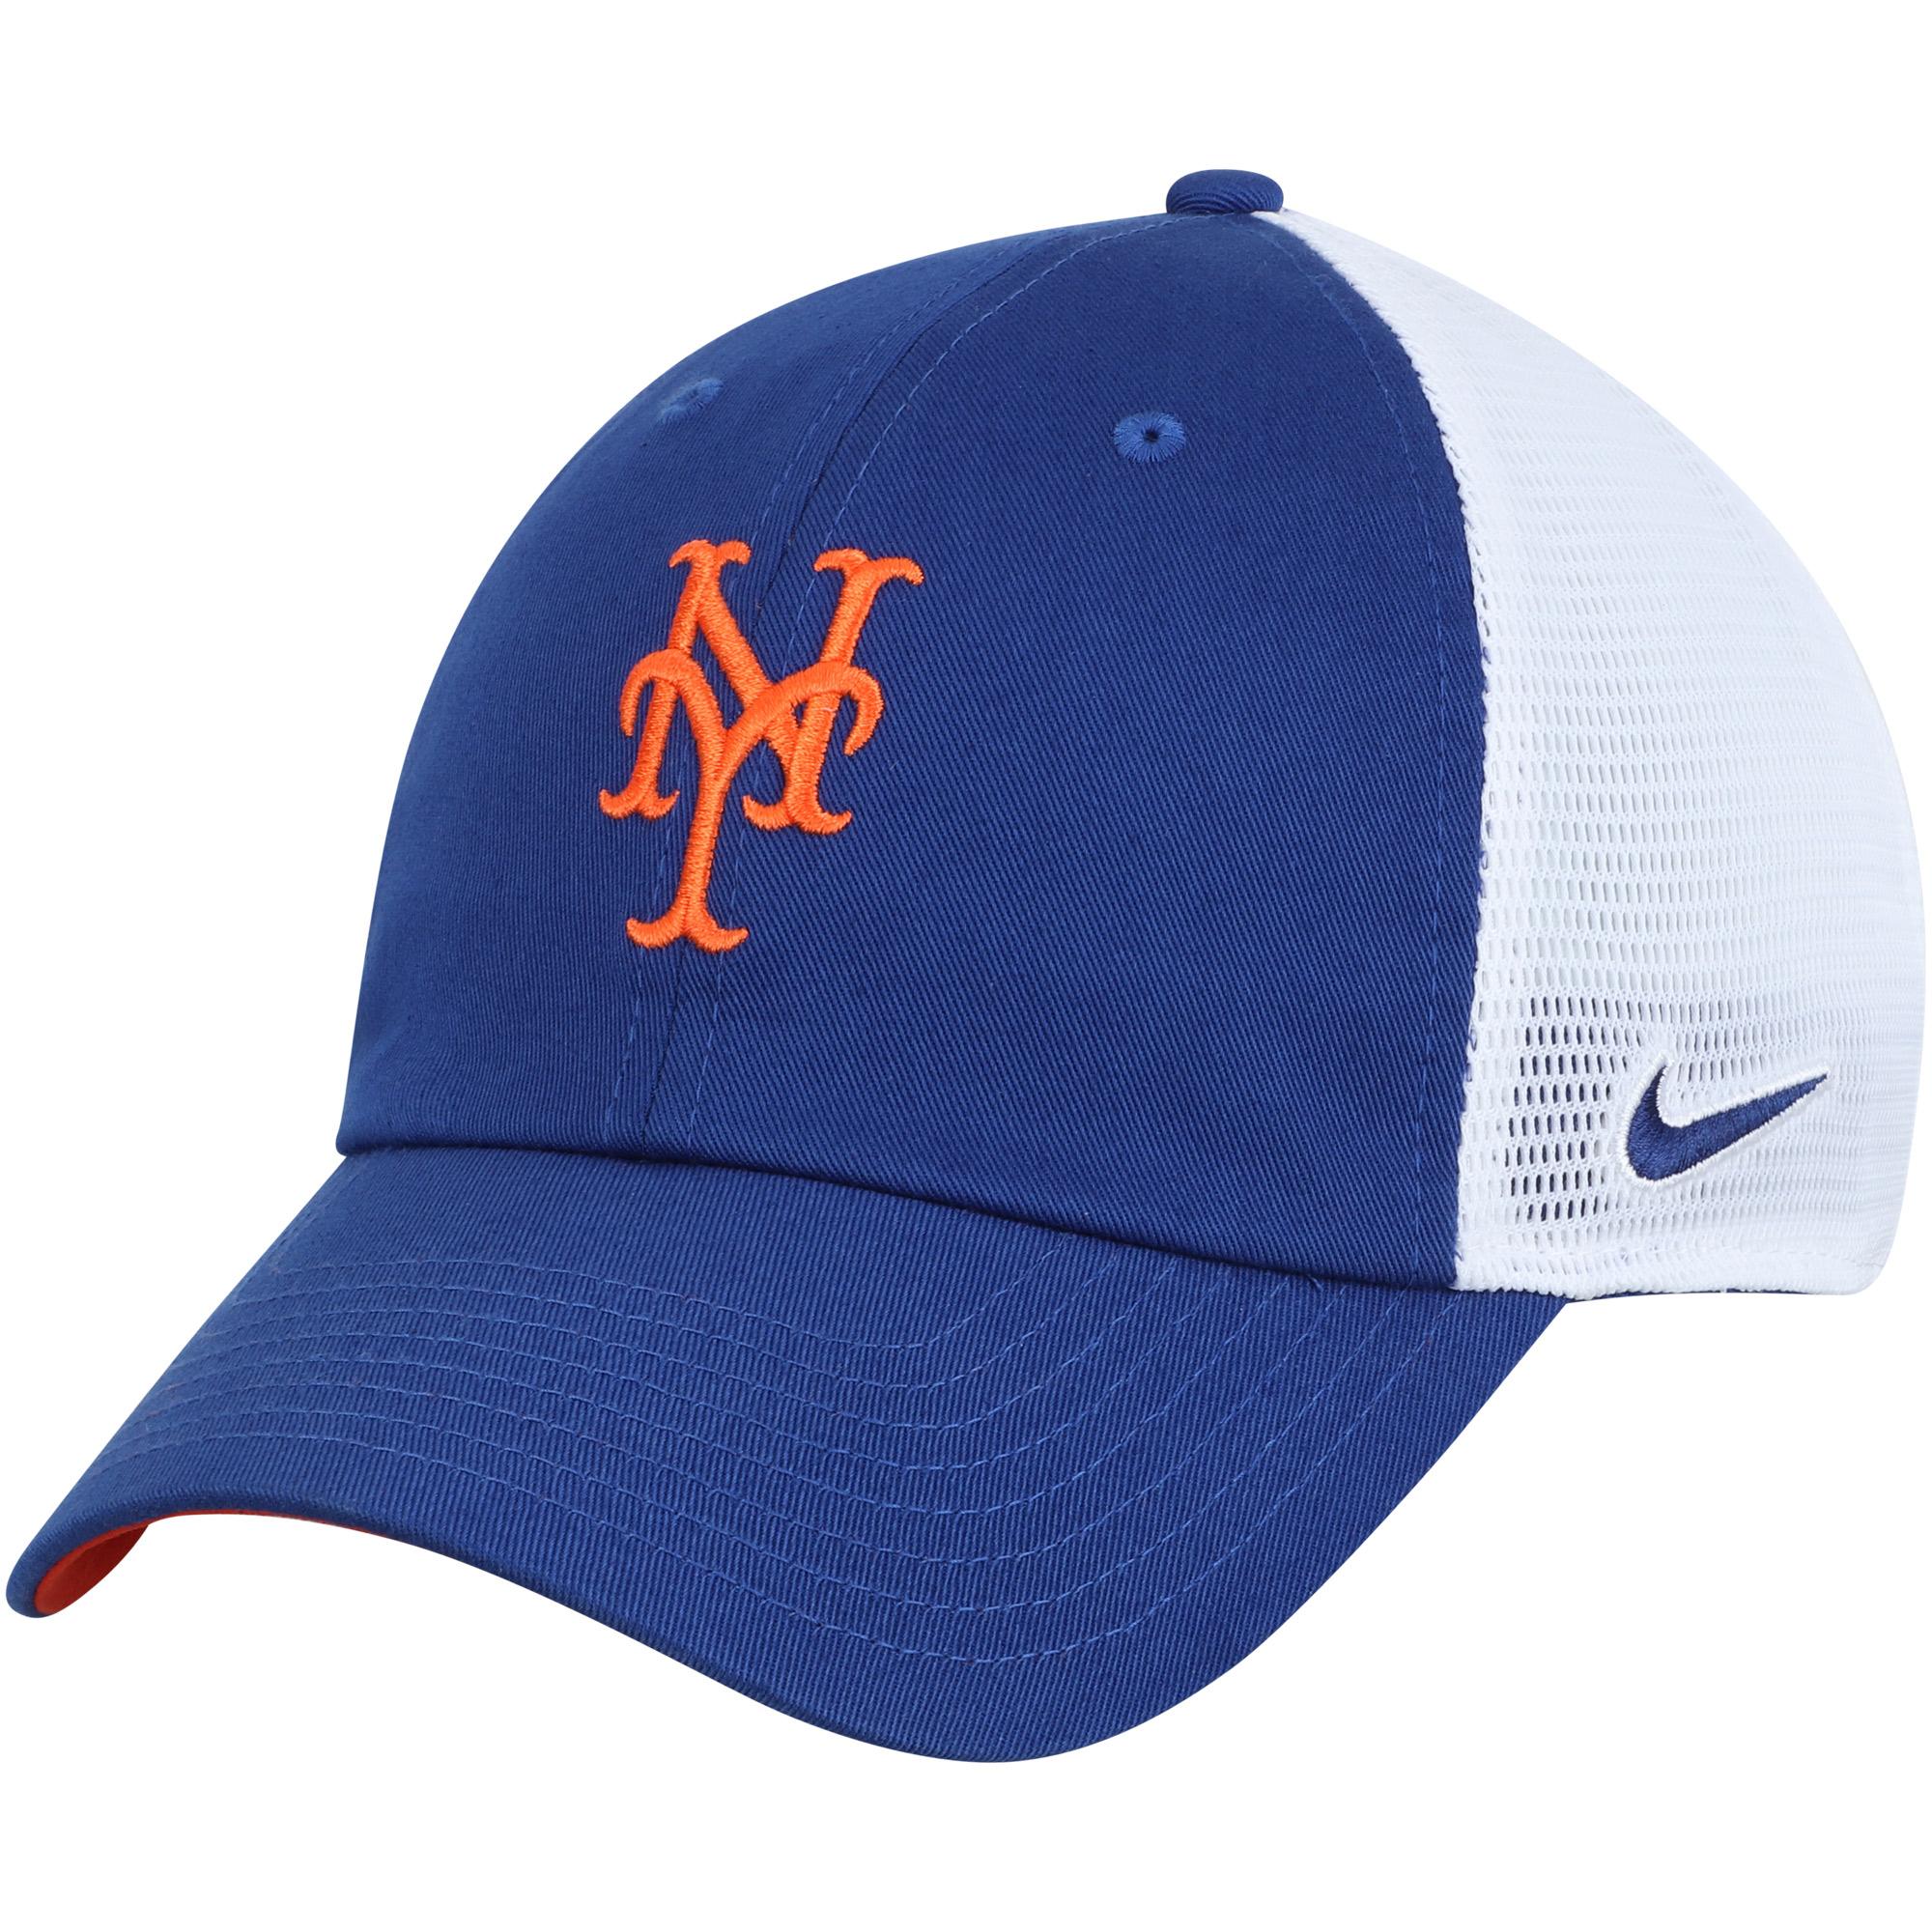 New York Mets Nike Heritage 86 Team Trucker Adjustable Hat - Royal/White - OSFA